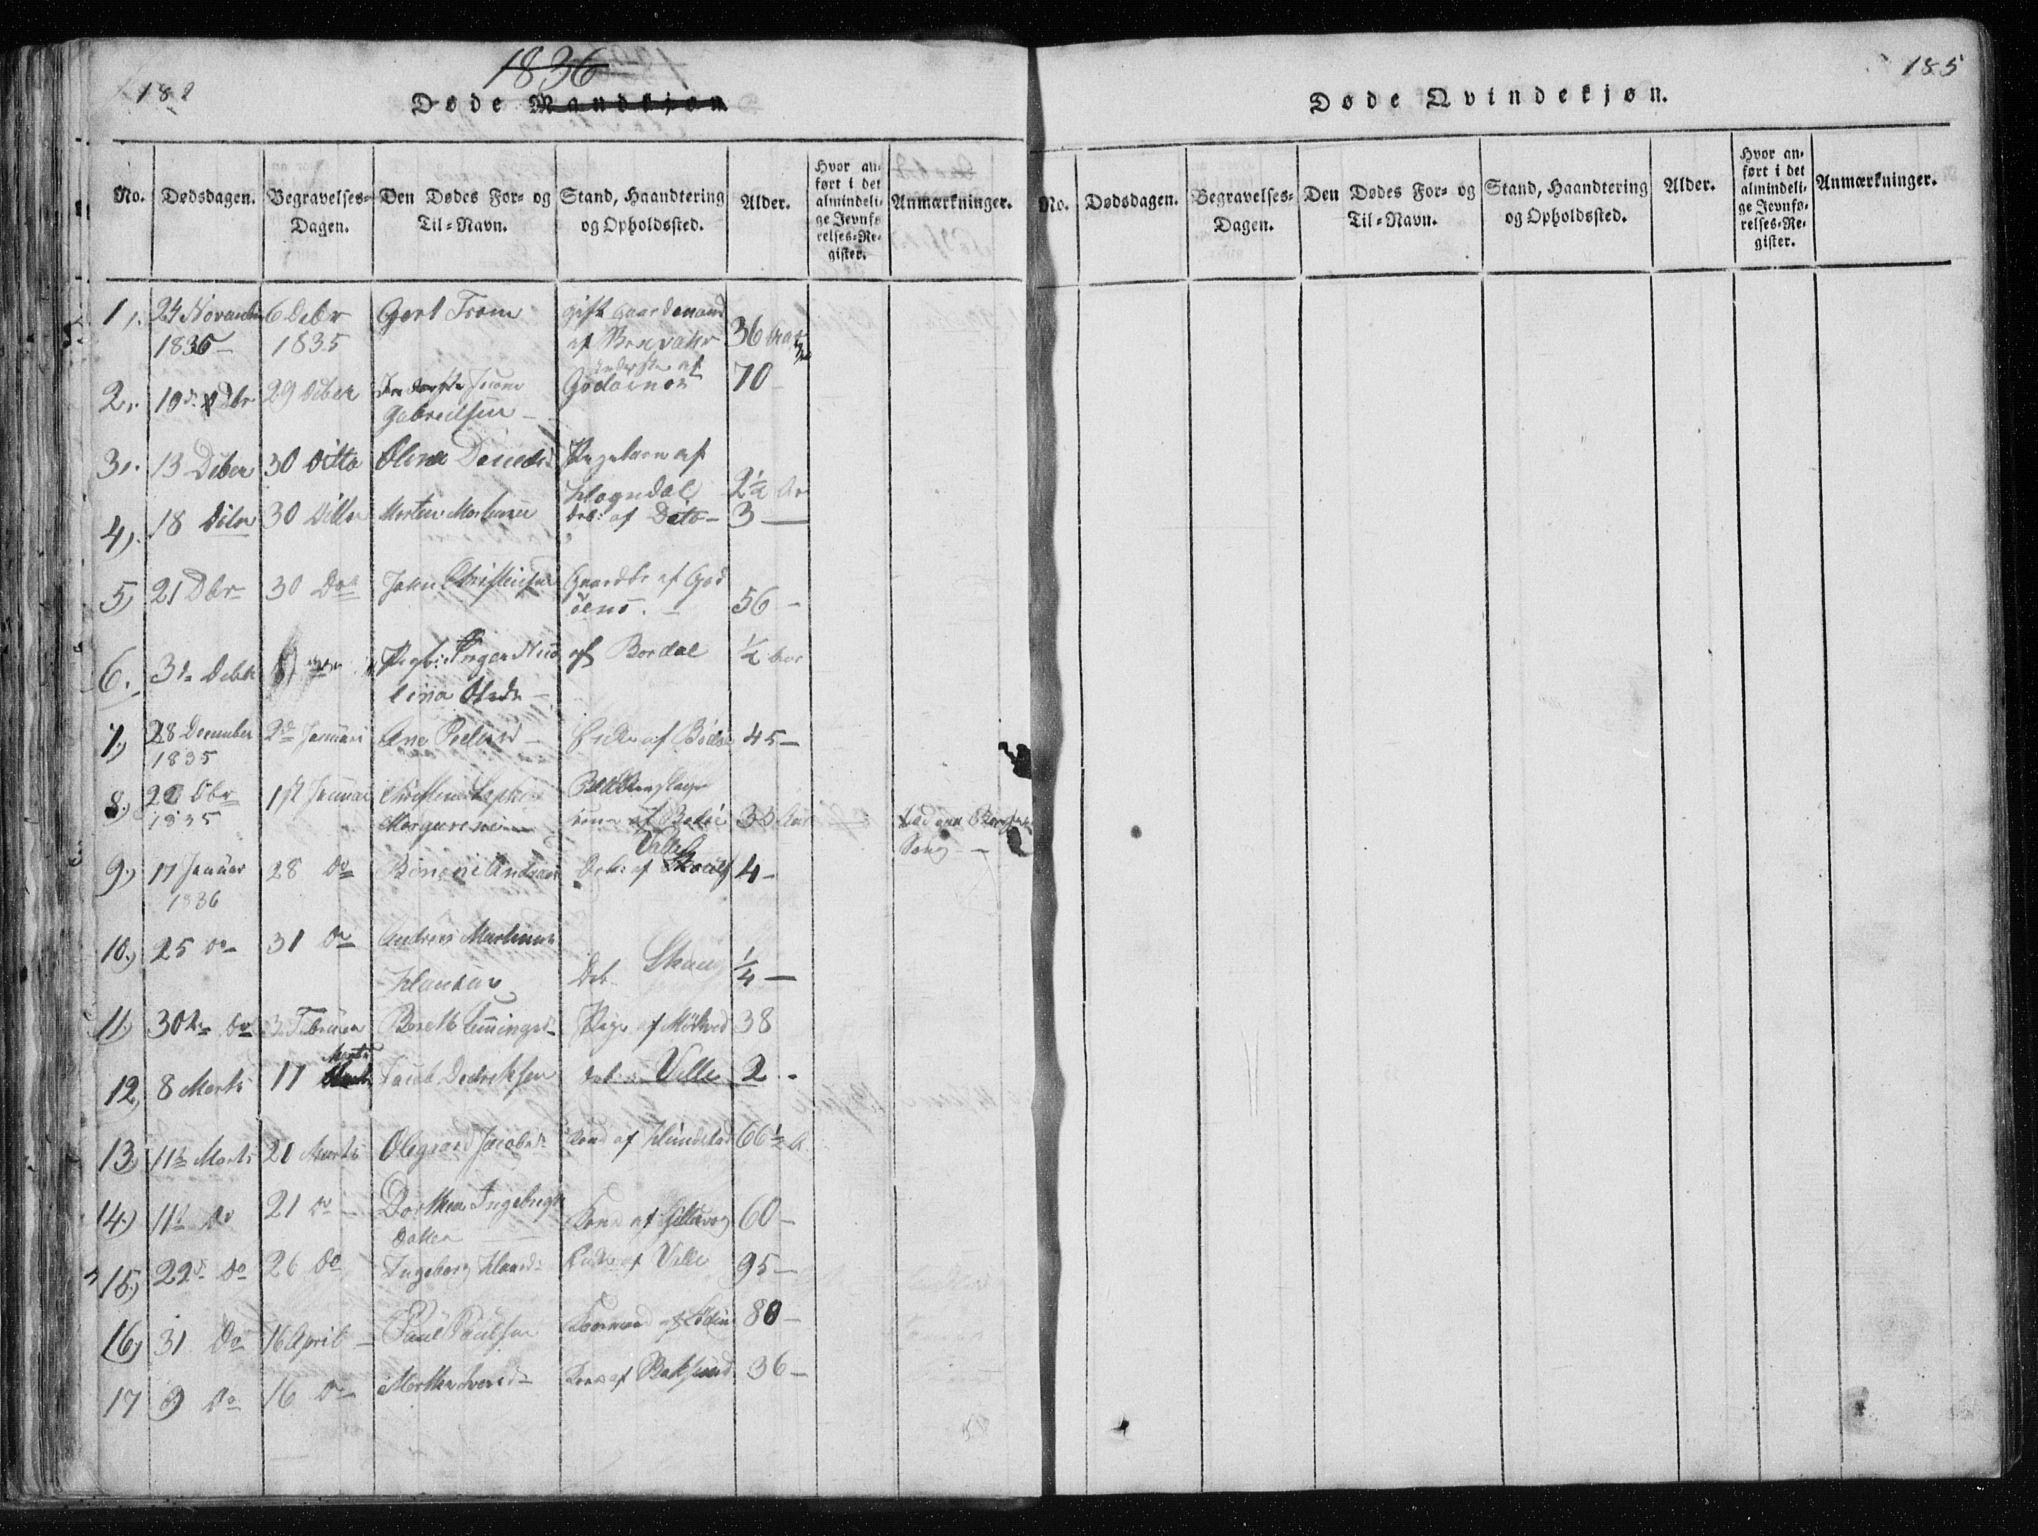 SAT, Ministerialprotokoller, klokkerbøker og fødselsregistre - Nordland, 801/L0027: Klokkerbok nr. 801C02, 1835-1845, s. 182-183